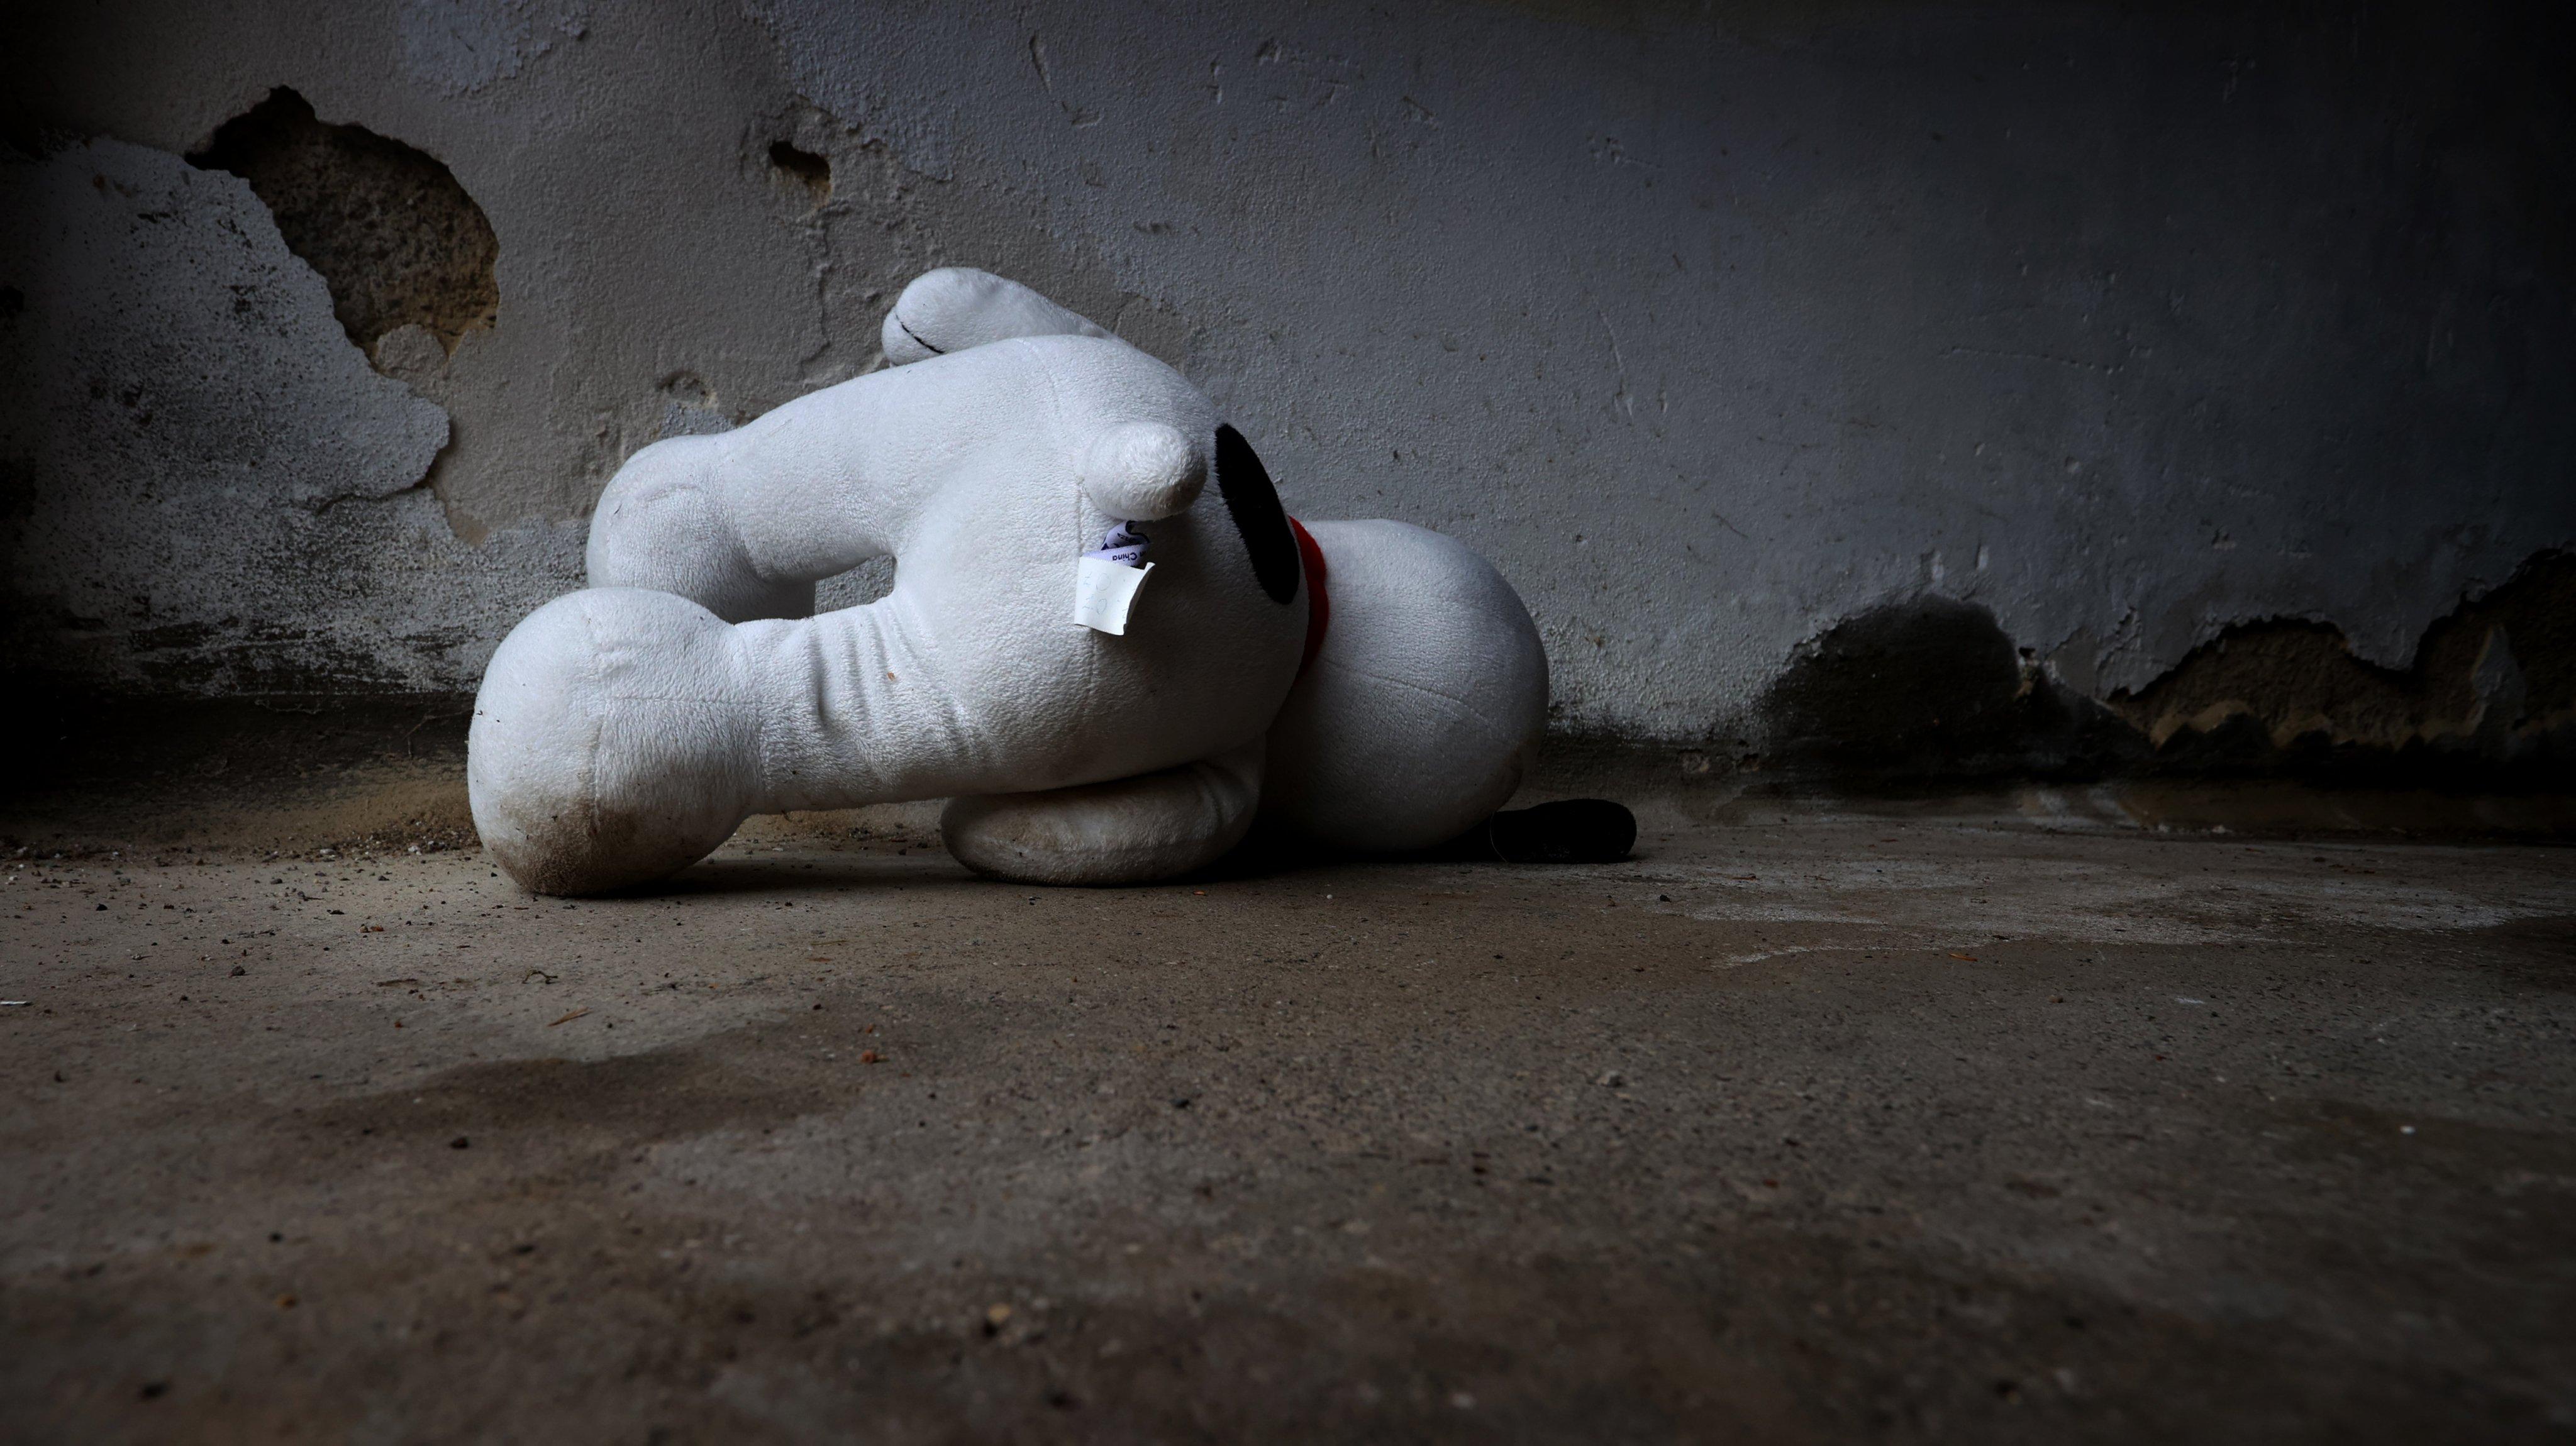 Symbolic image - Violence against children